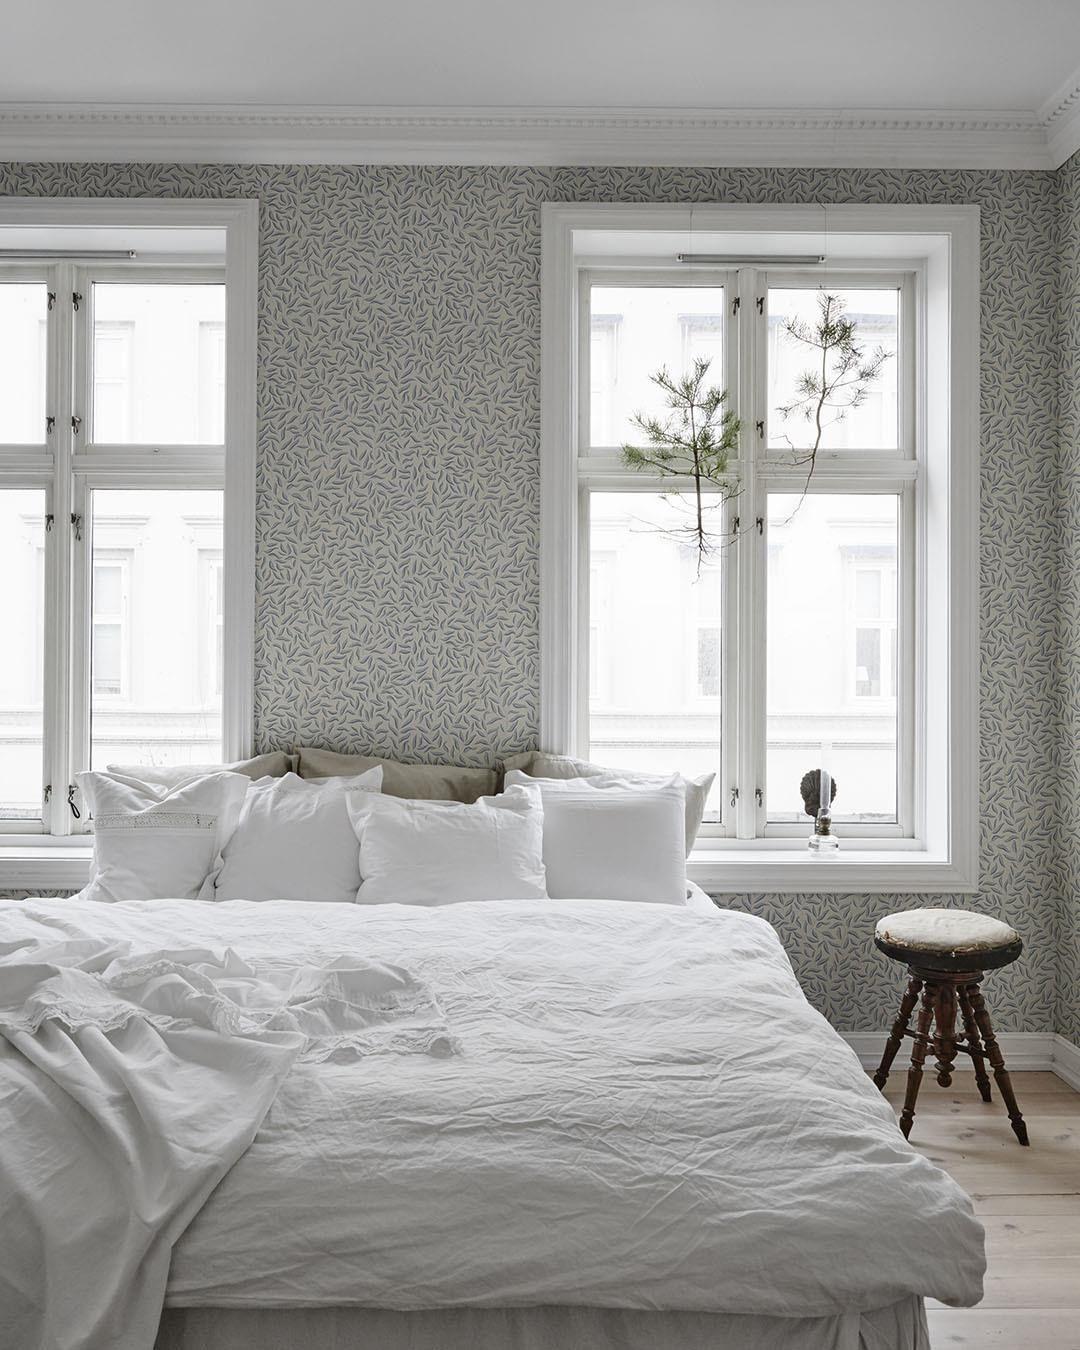 Decorating with wallpaper sandberg karolina blue